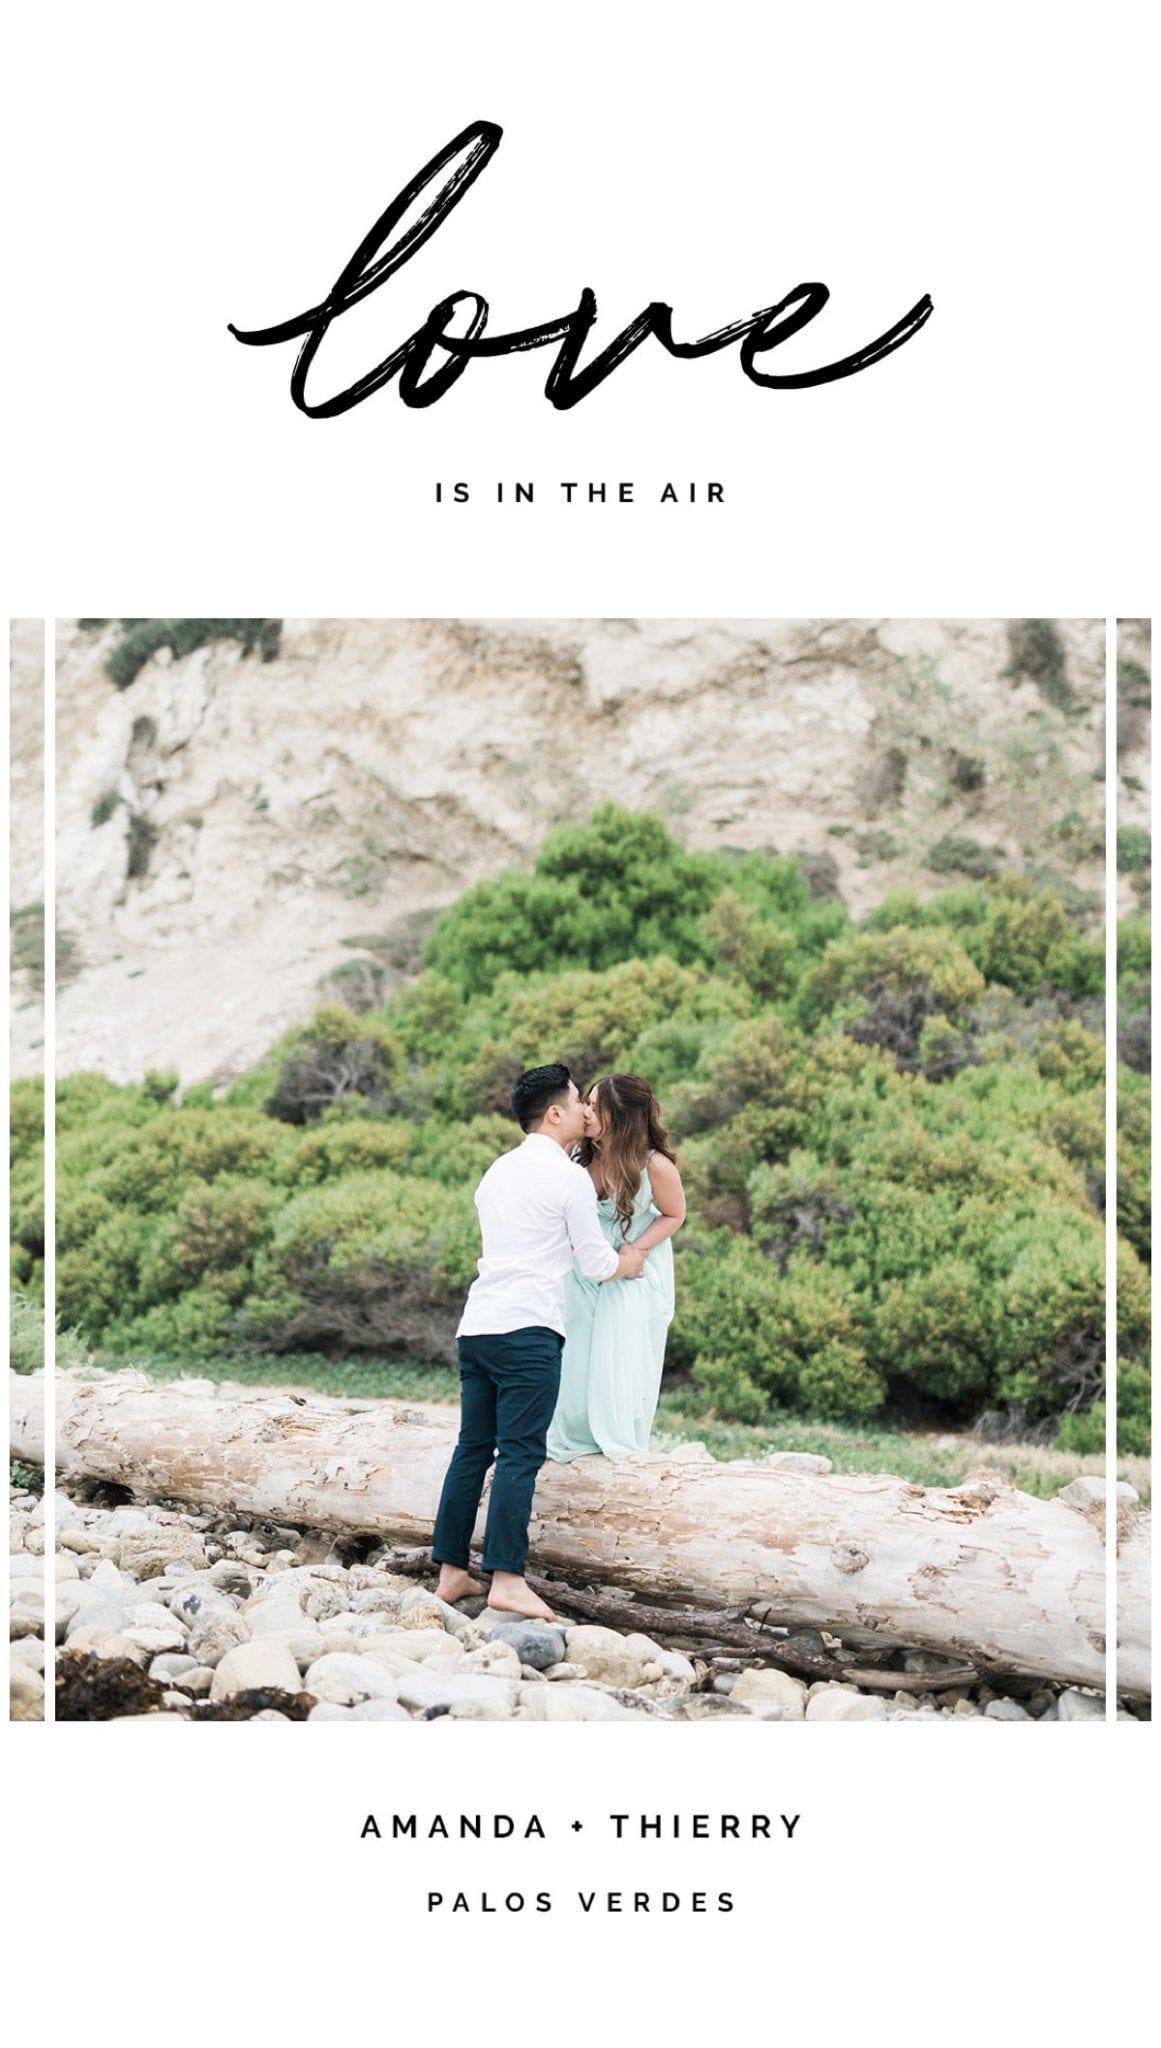 Amanda-Thierry-Palos-Verdes-Engagement-Carissa-Woo-Photography_0039.jpg